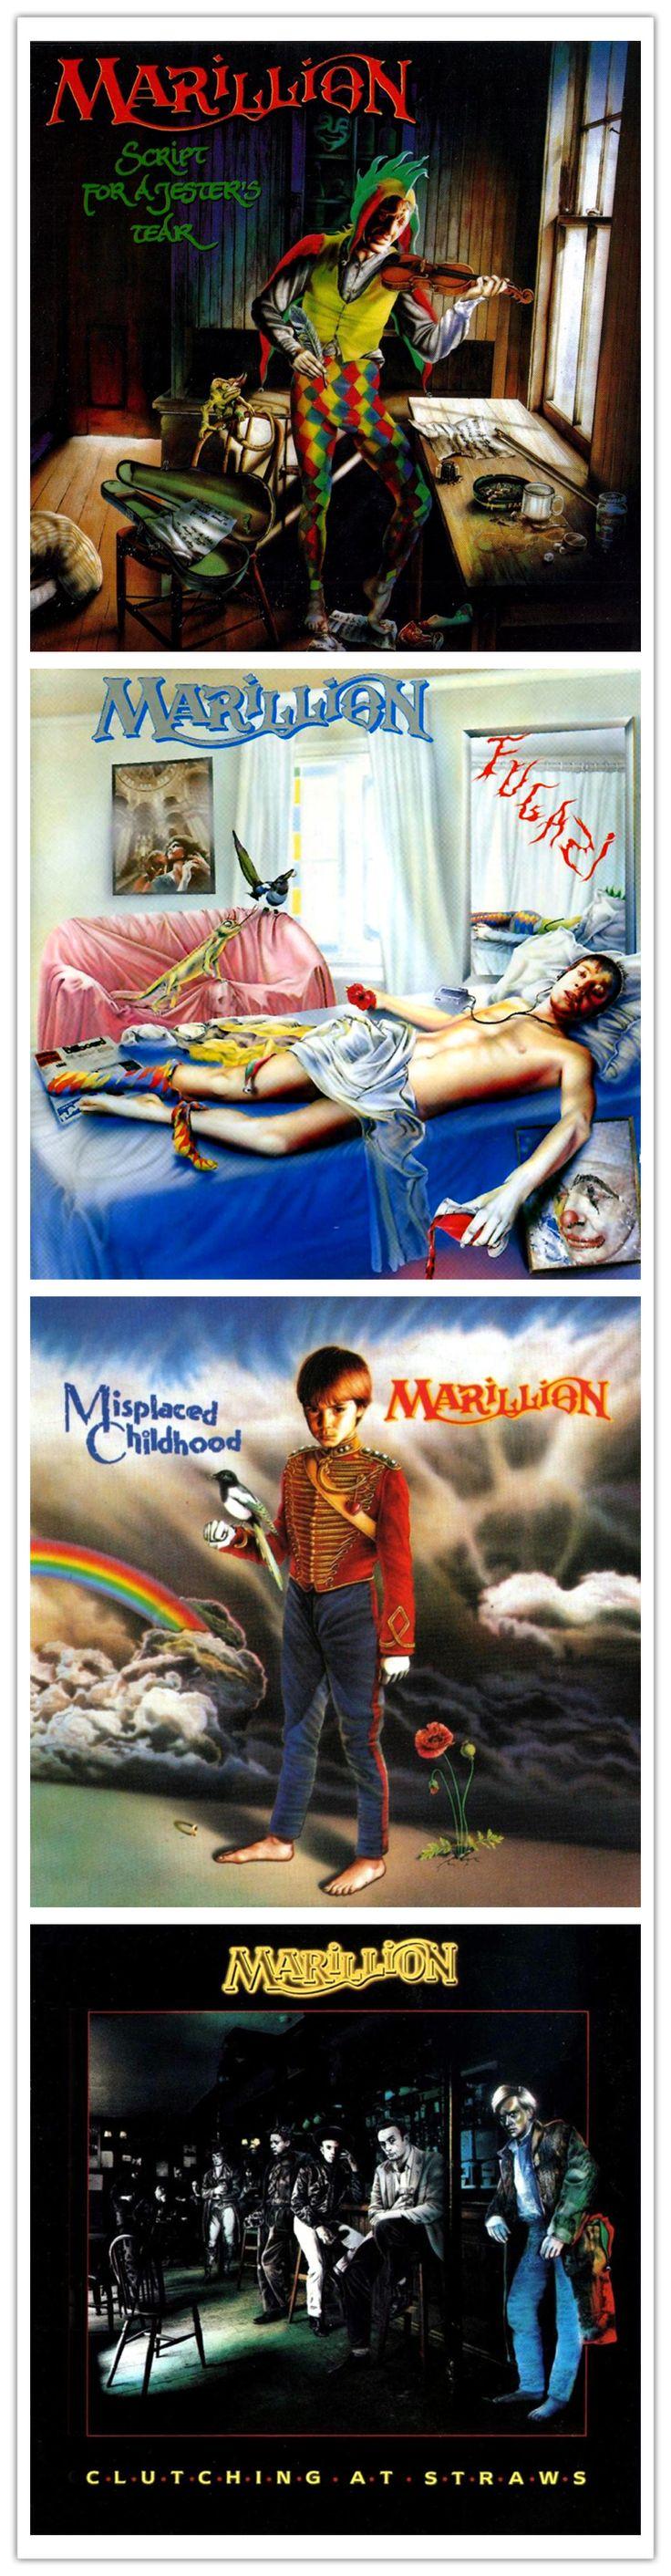 Marillion album art, 1983 - 1987, their first four studio albums with FISH as frontman, artwork Mark Wilkinson